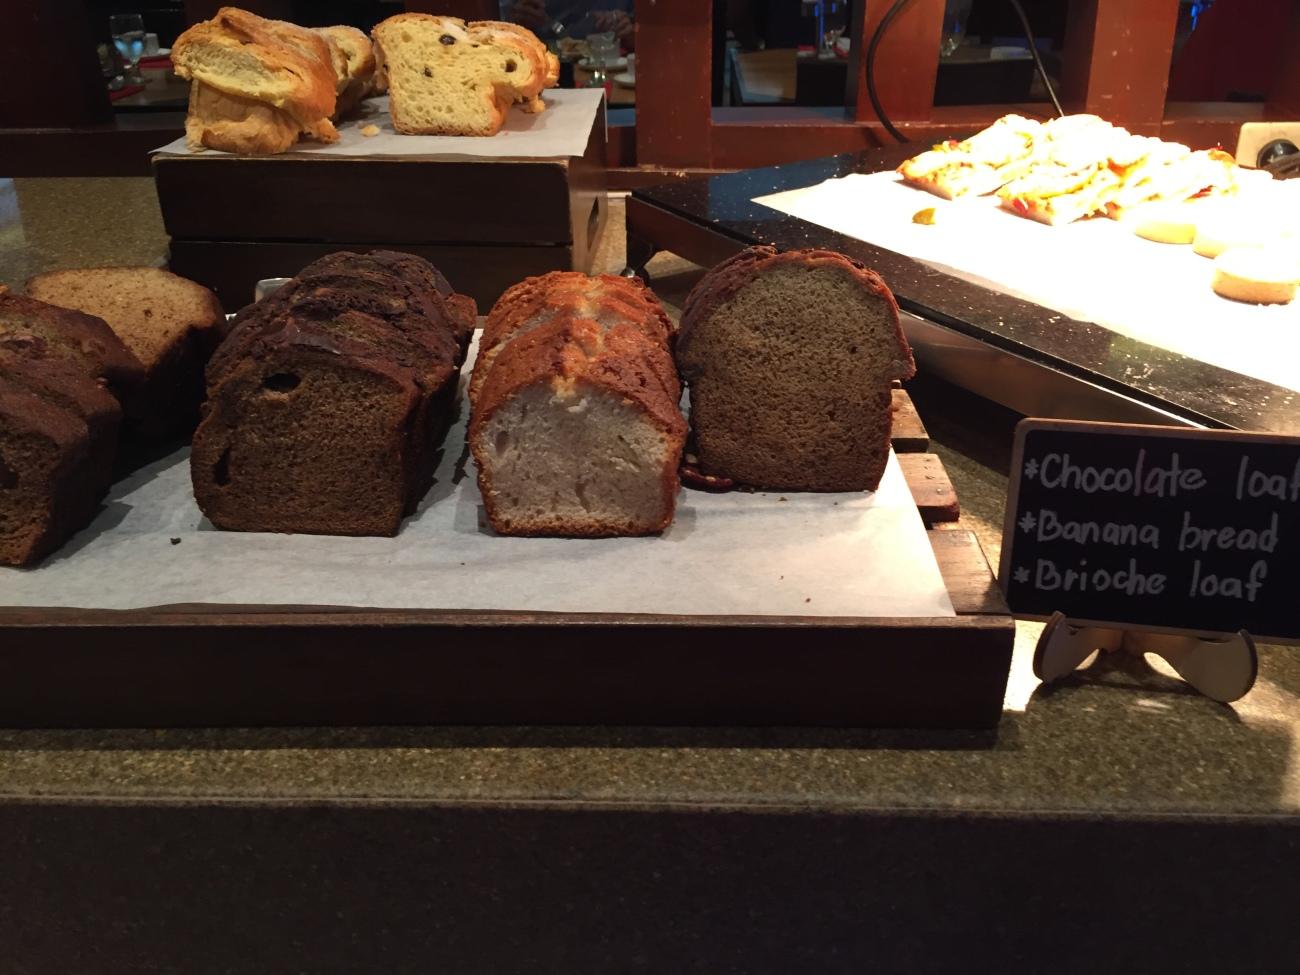 Chocolate loaf and banana bread